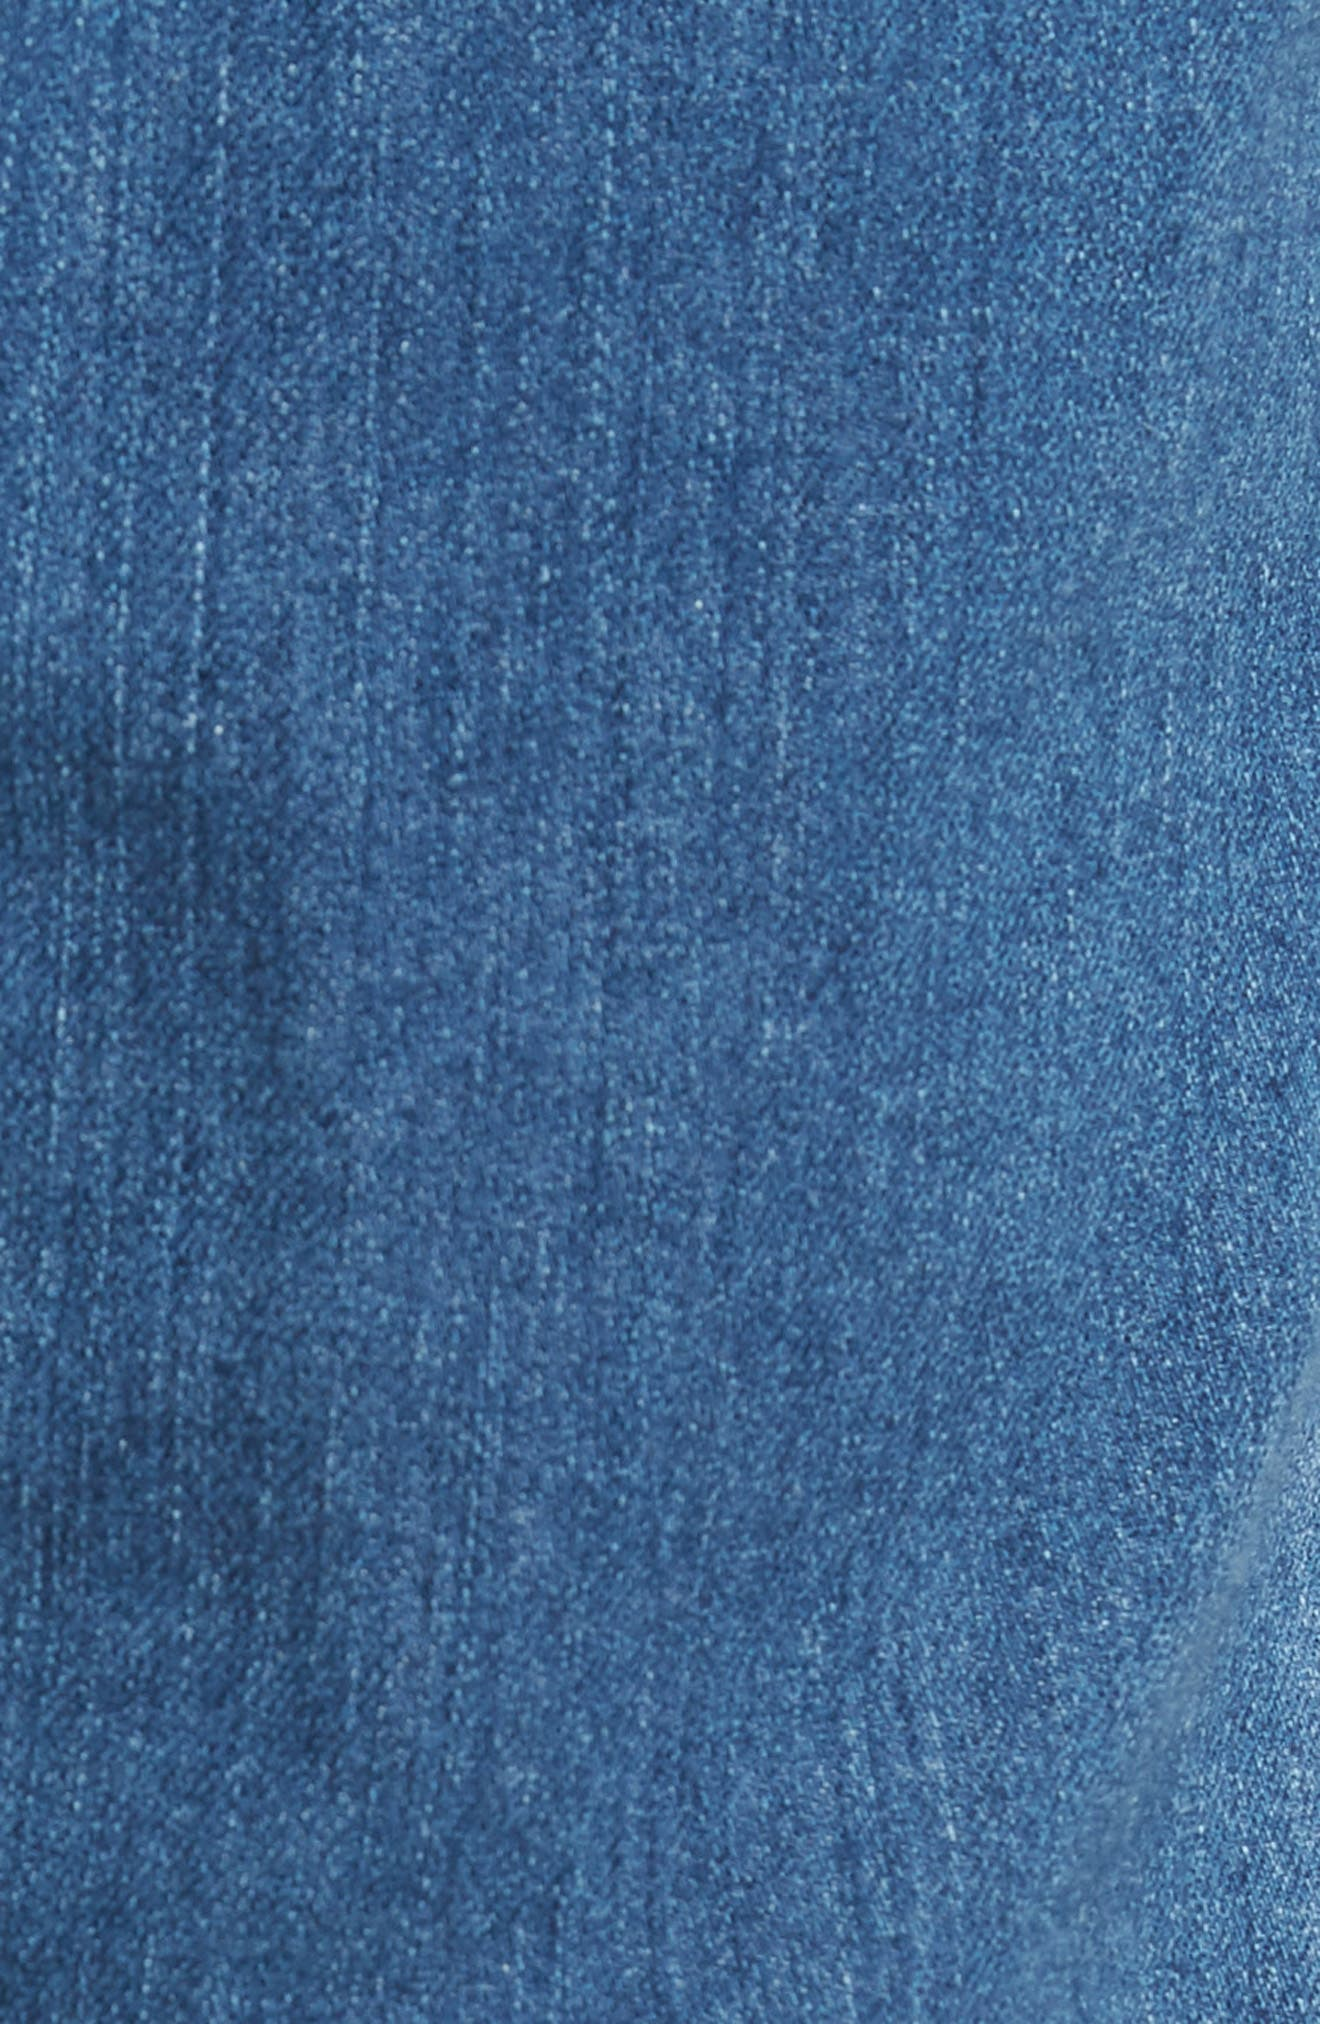 Everett Slim Straight Leg Jeans,                             Alternate thumbnail 5, color,                             SEA WAVE